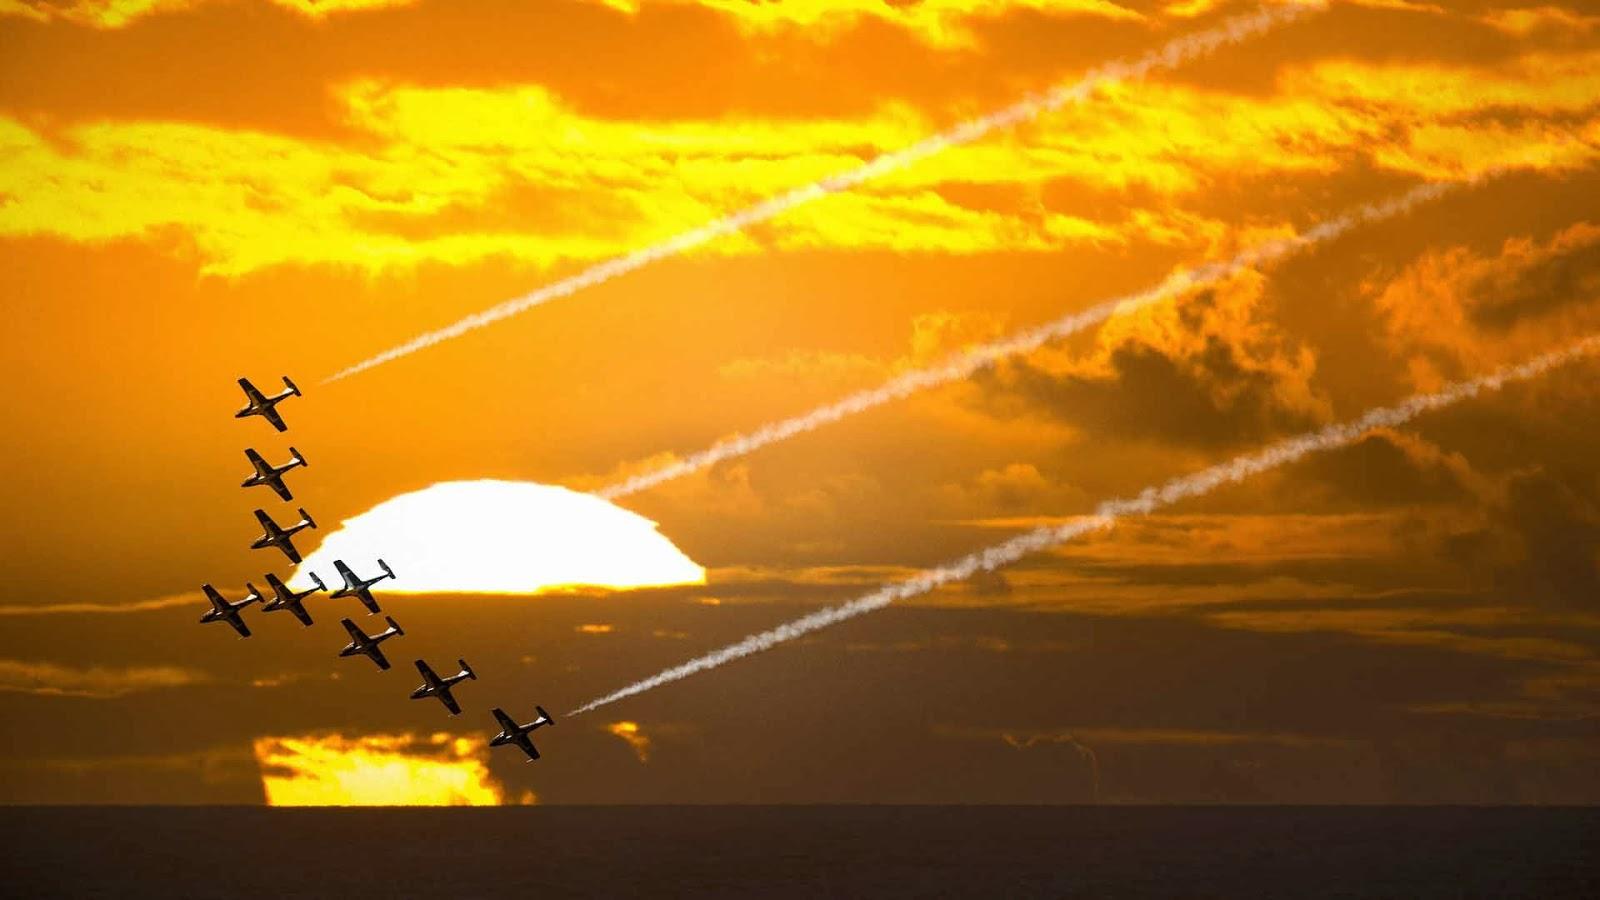 Evening Good Saturday Flights Aeroplanes Aeroplane Wallpapers HD Desktop